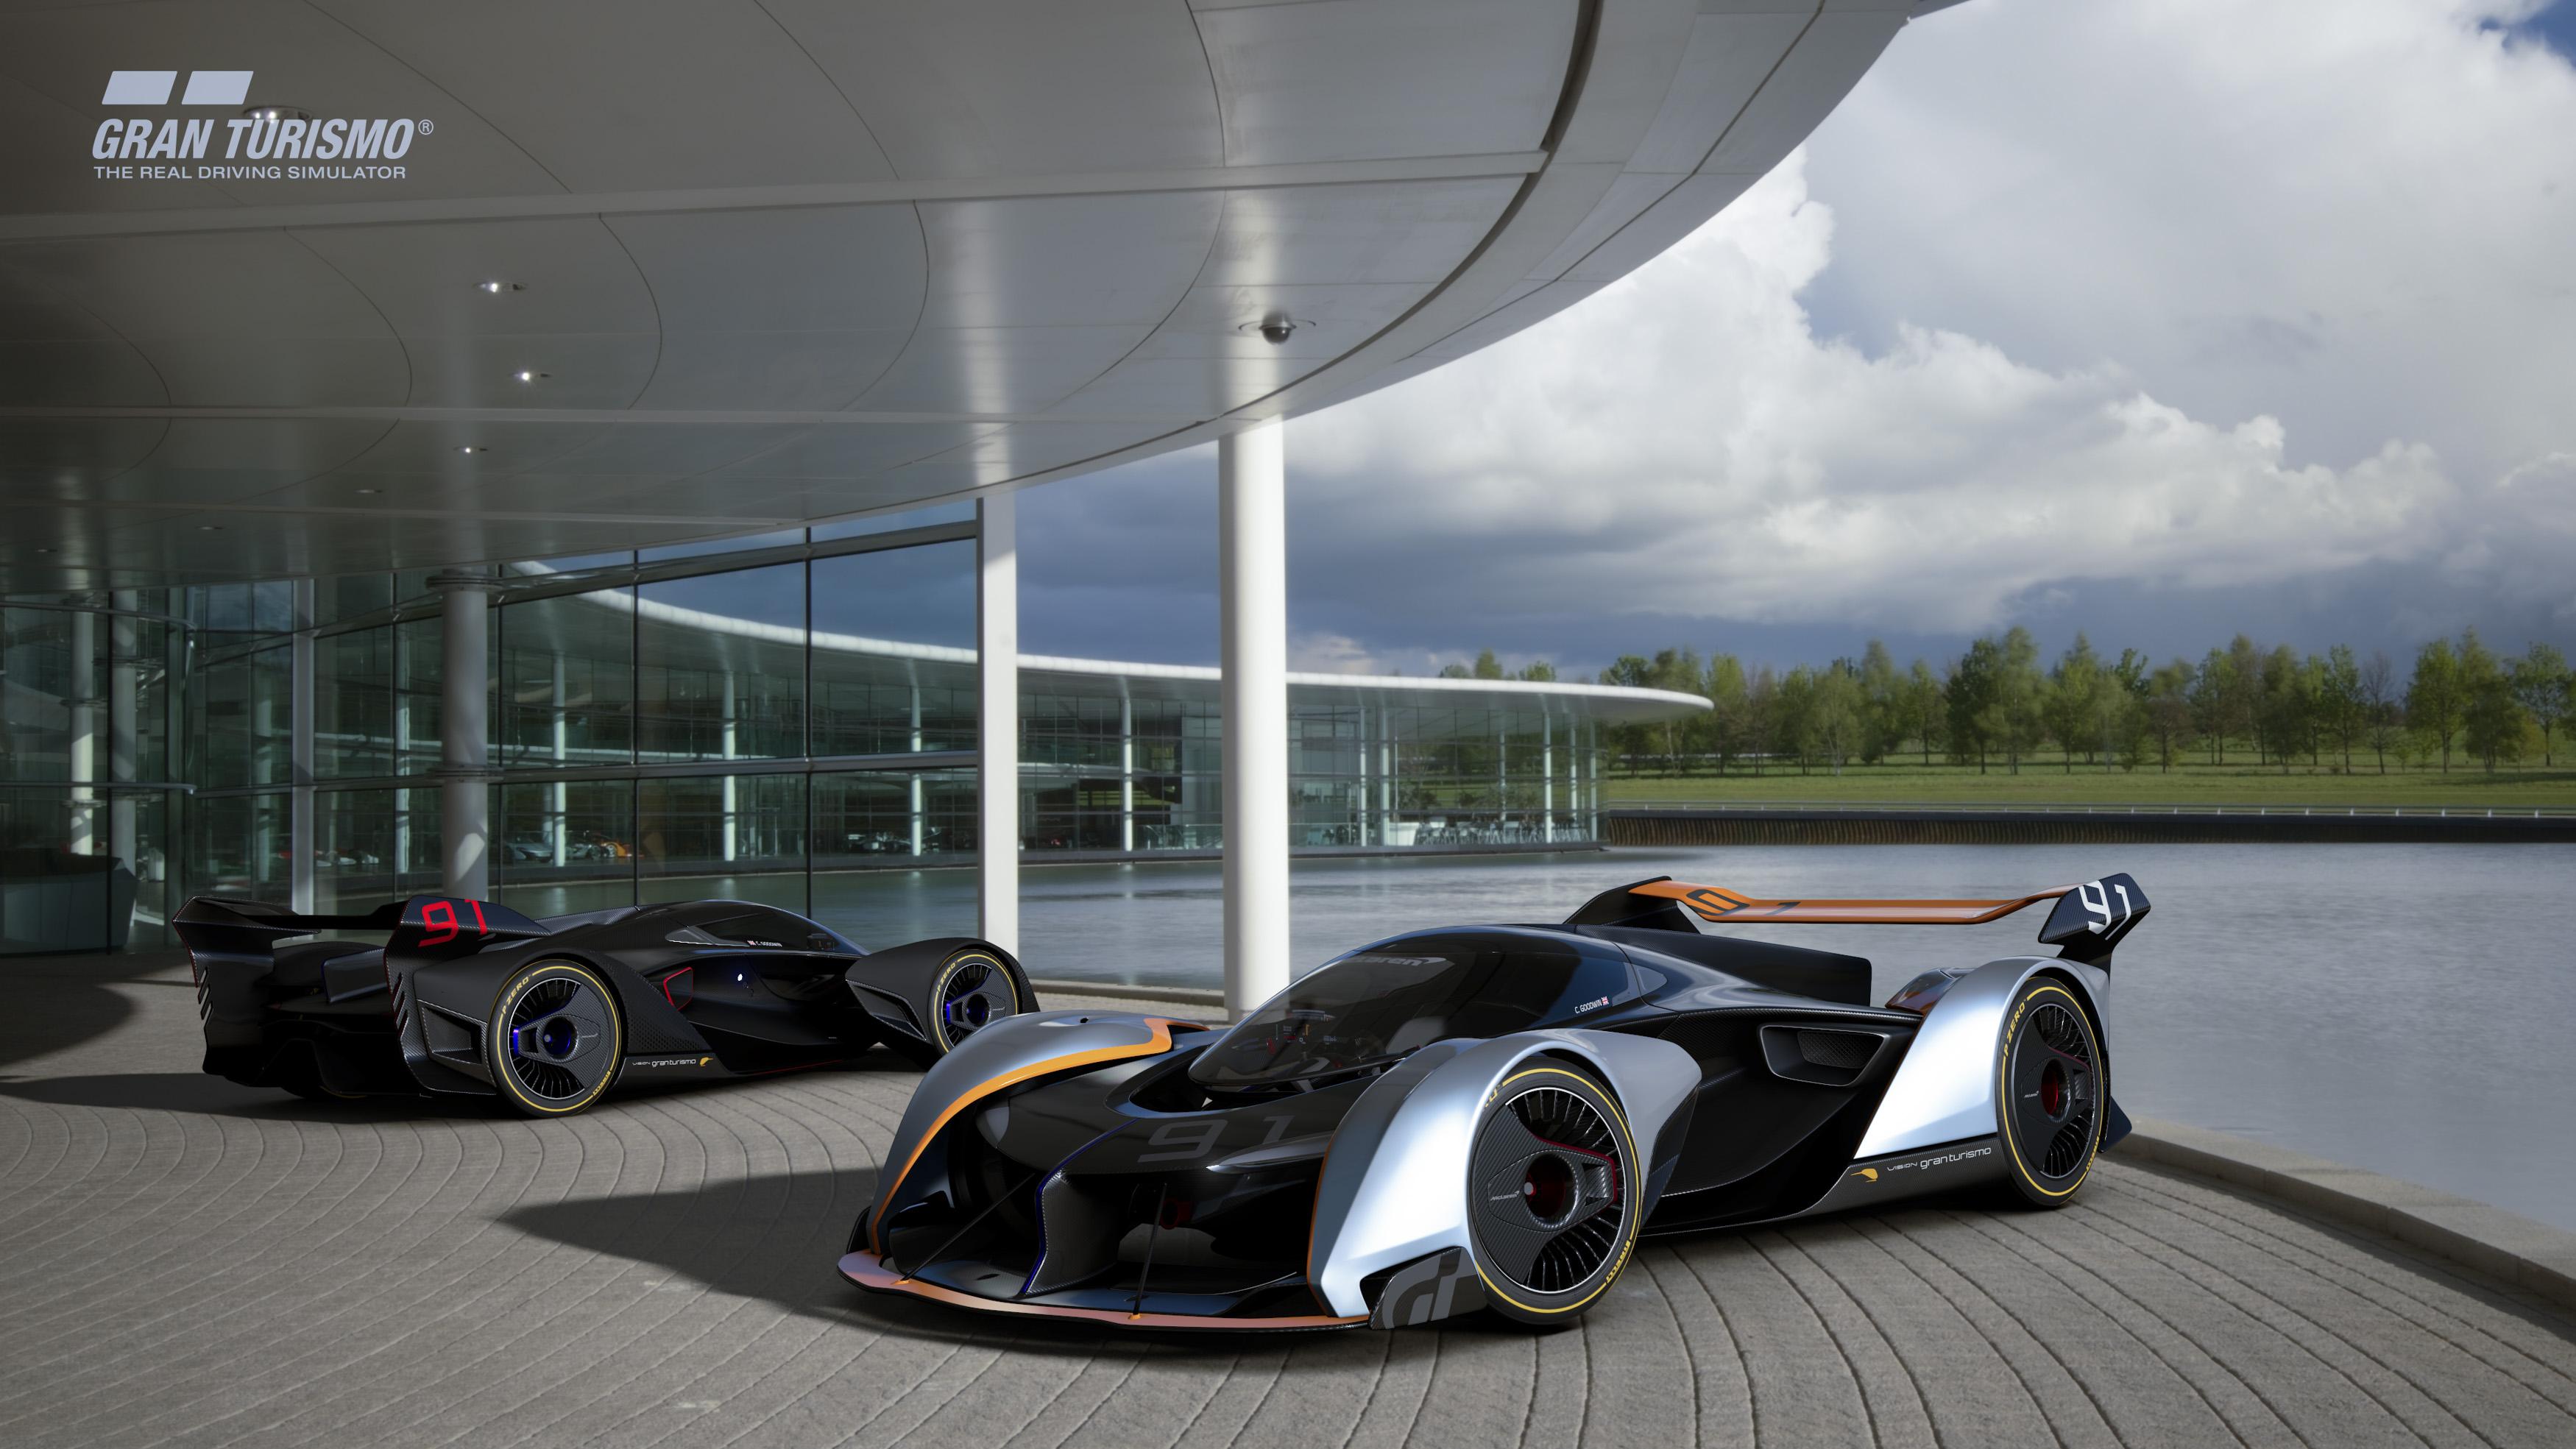 Mclaren F1 Iphone Wallpaper Mclaren Ultimate Vision Gt For Ps4 Gran Turismo Sport 8